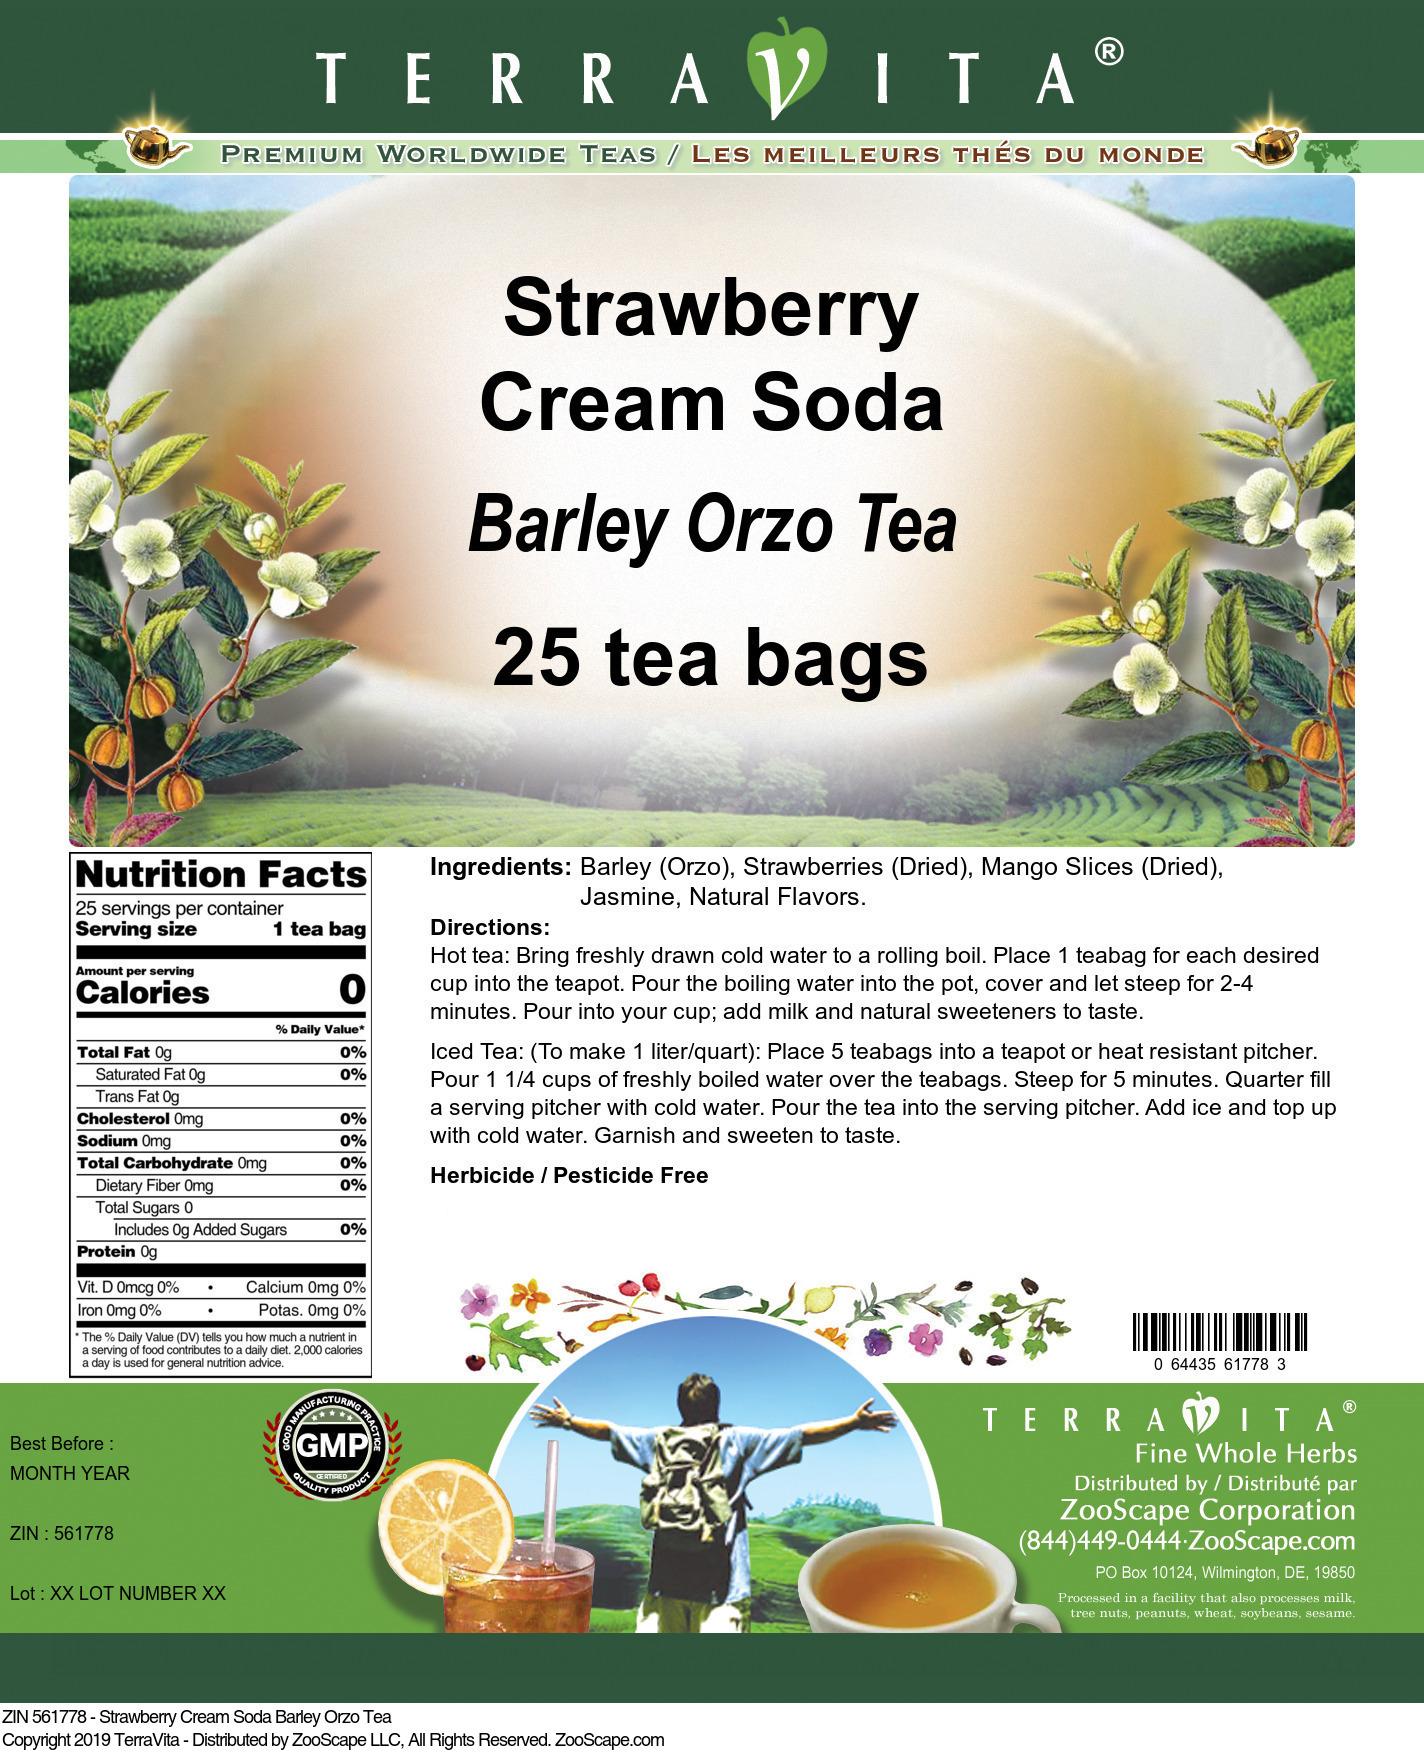 Strawberry Cream Soda Barley Orzo Tea